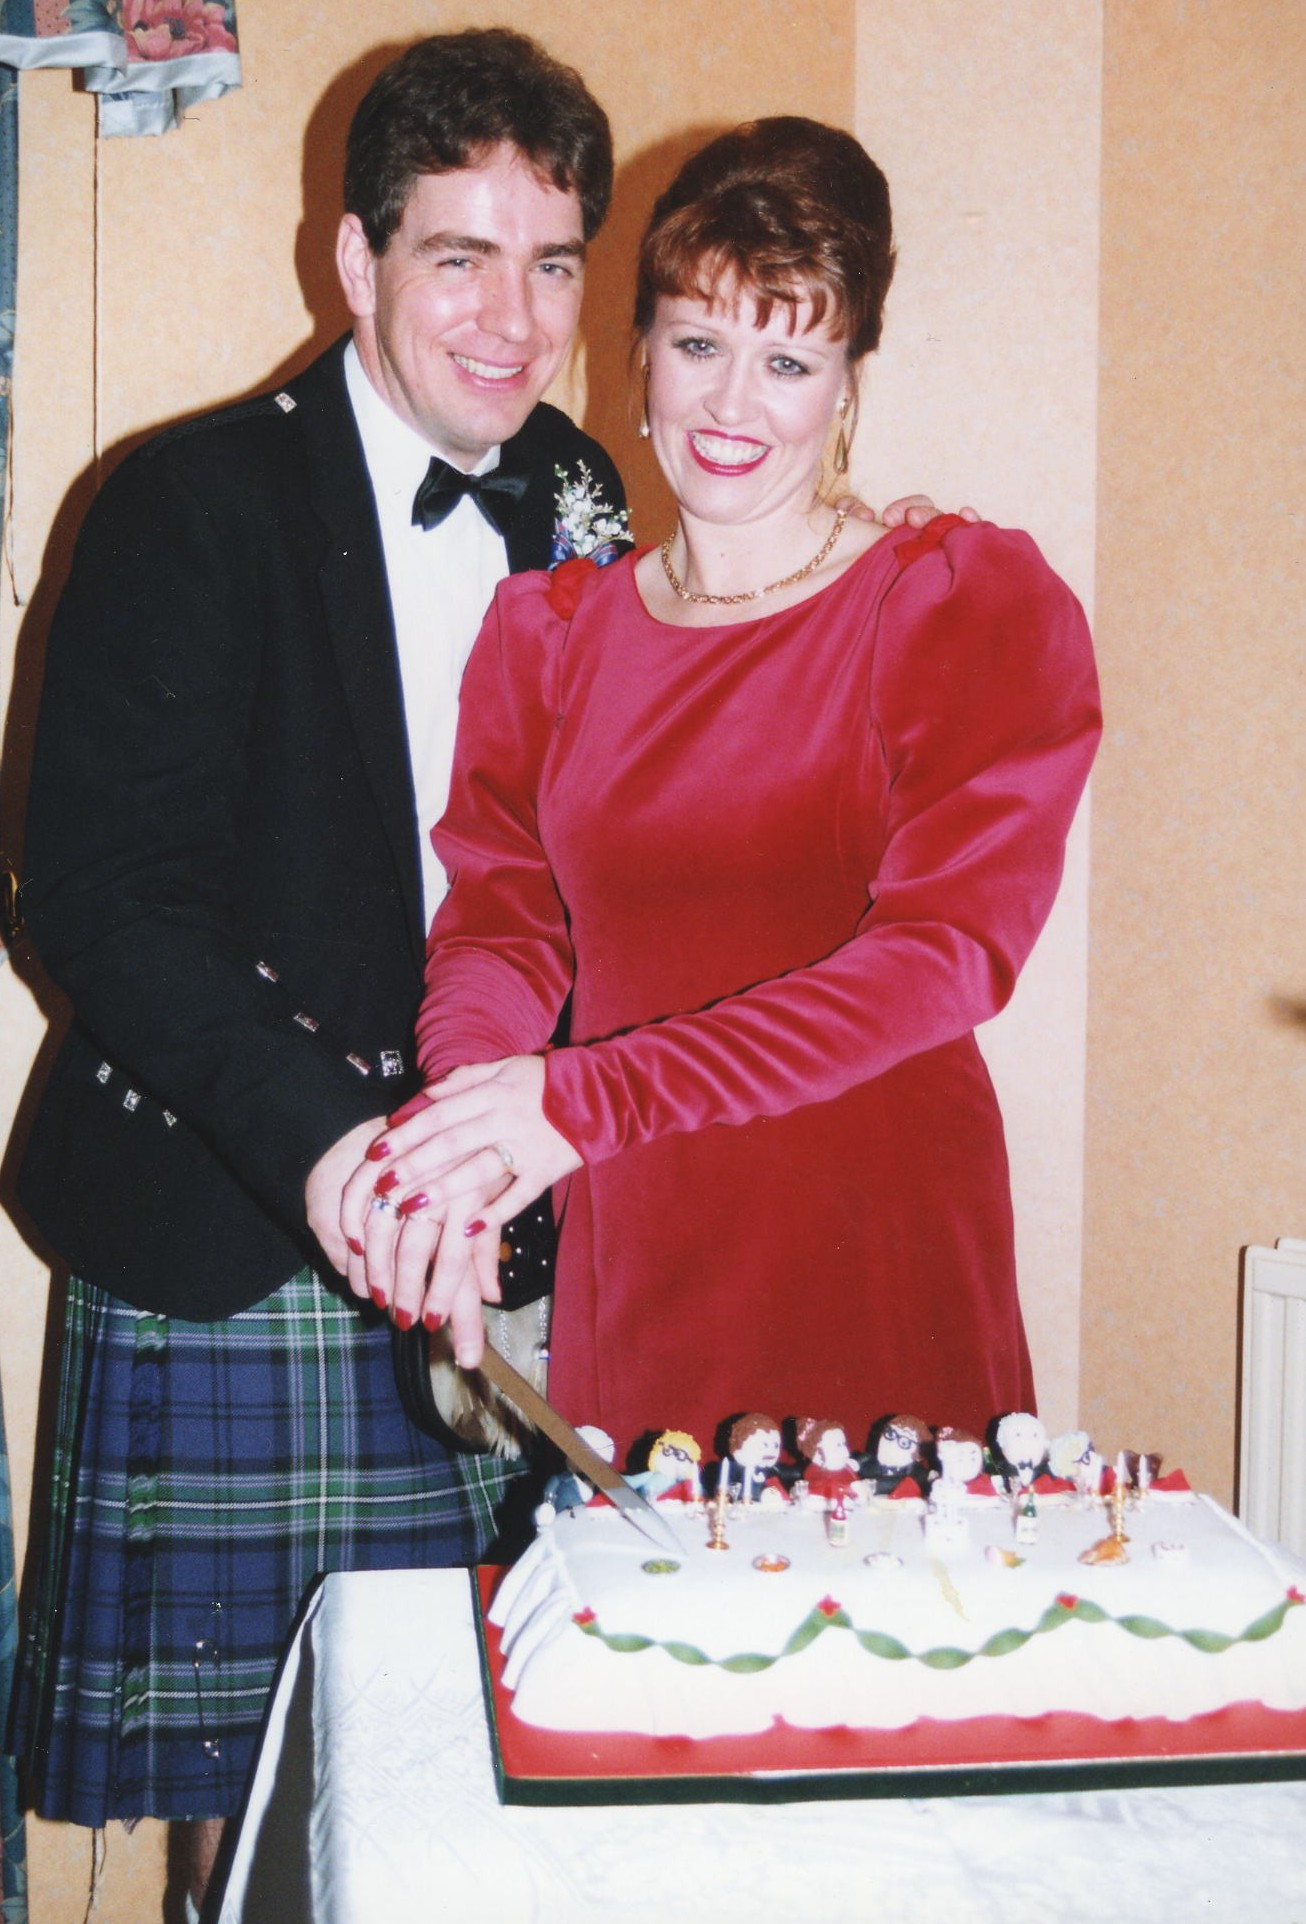 David Whyte & Lorna Wilson's Wedding